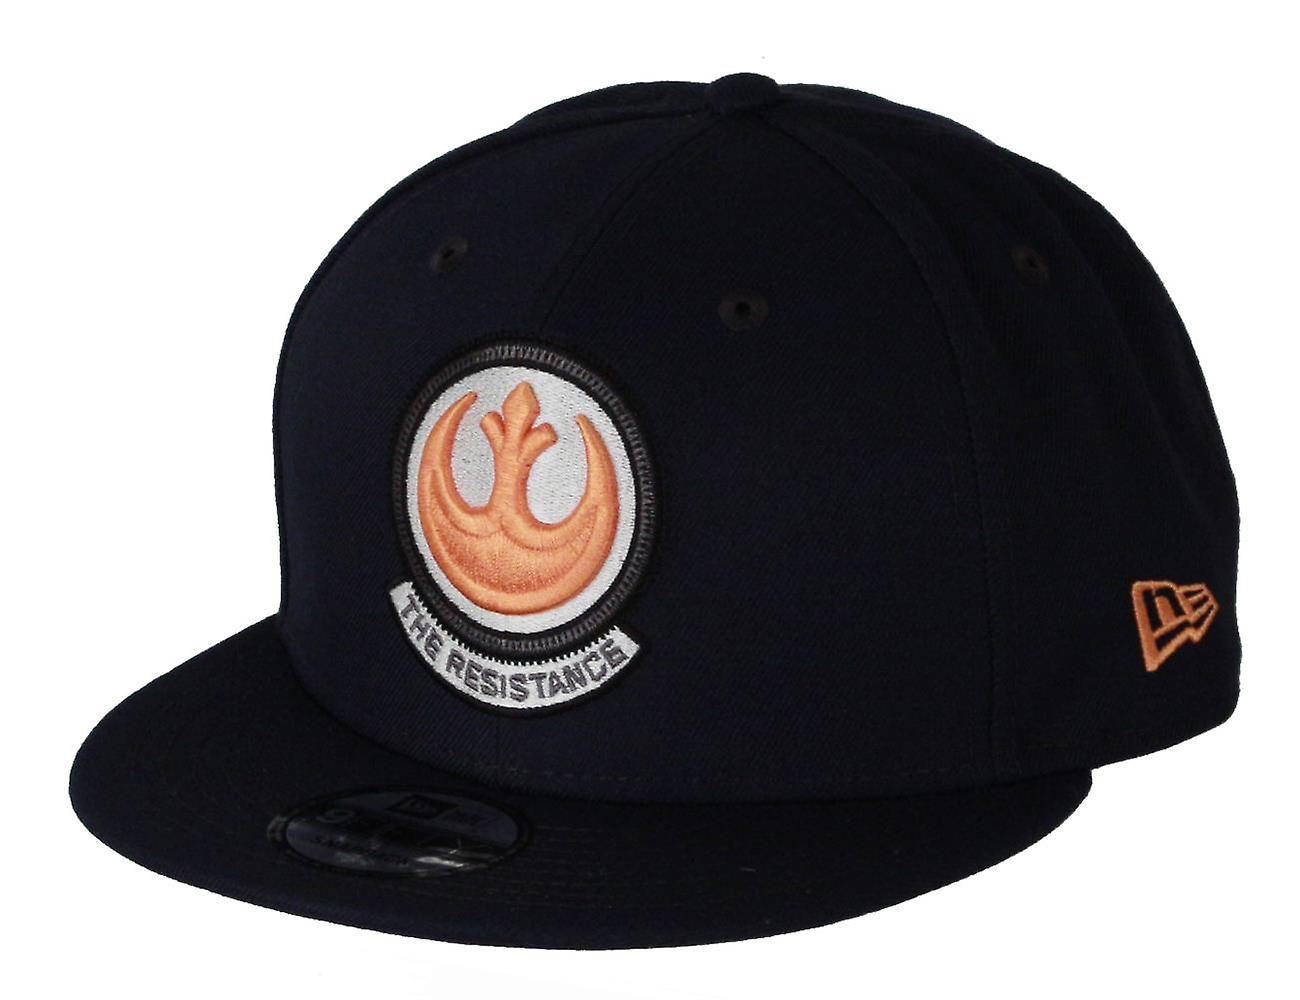 New Era Adjustable 9 Fifty Snapback Cap ~ Star Wars- Rebel Resistance